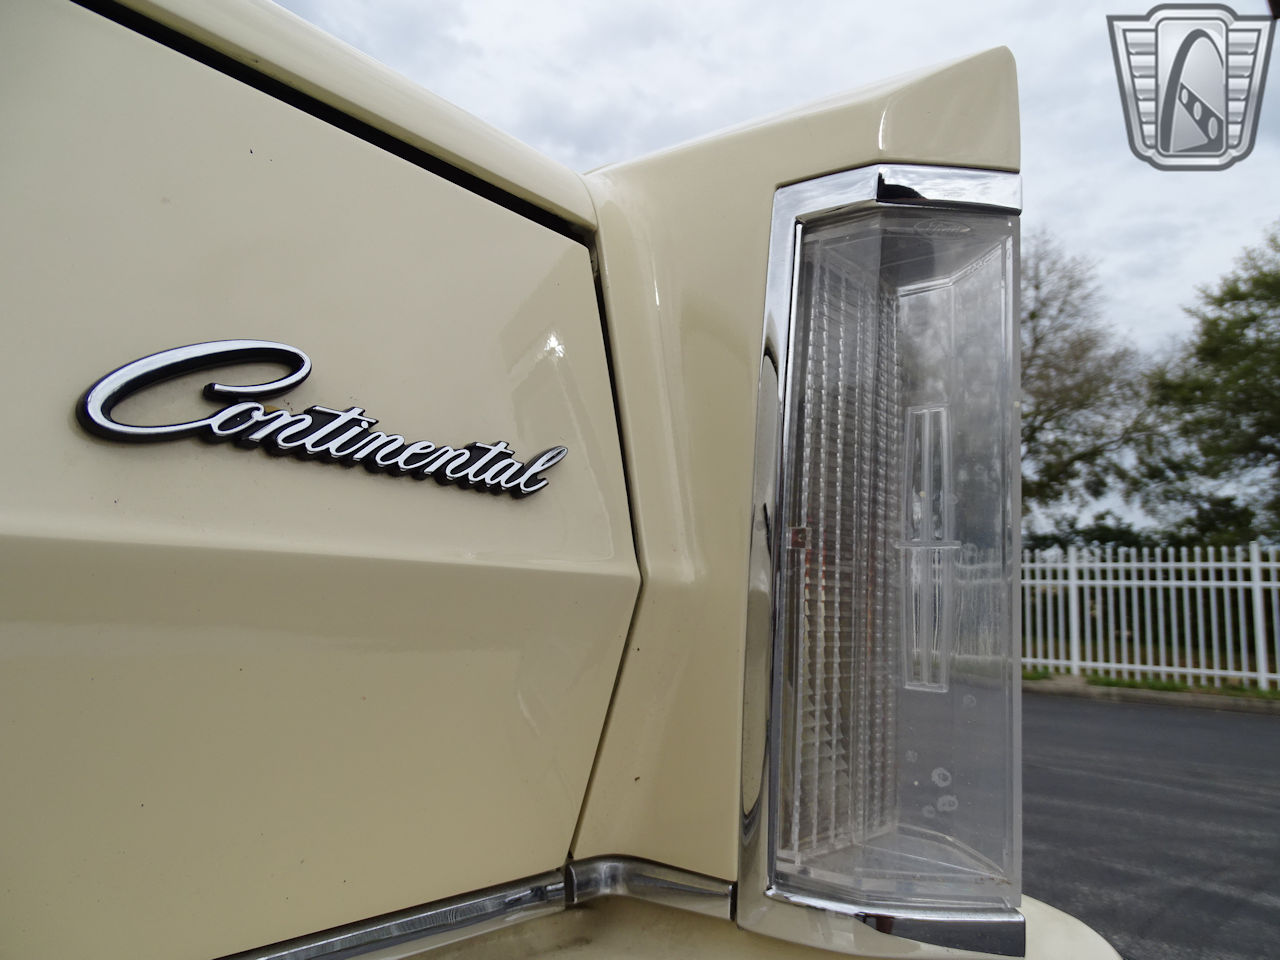 1983 Lincoln Continental 30